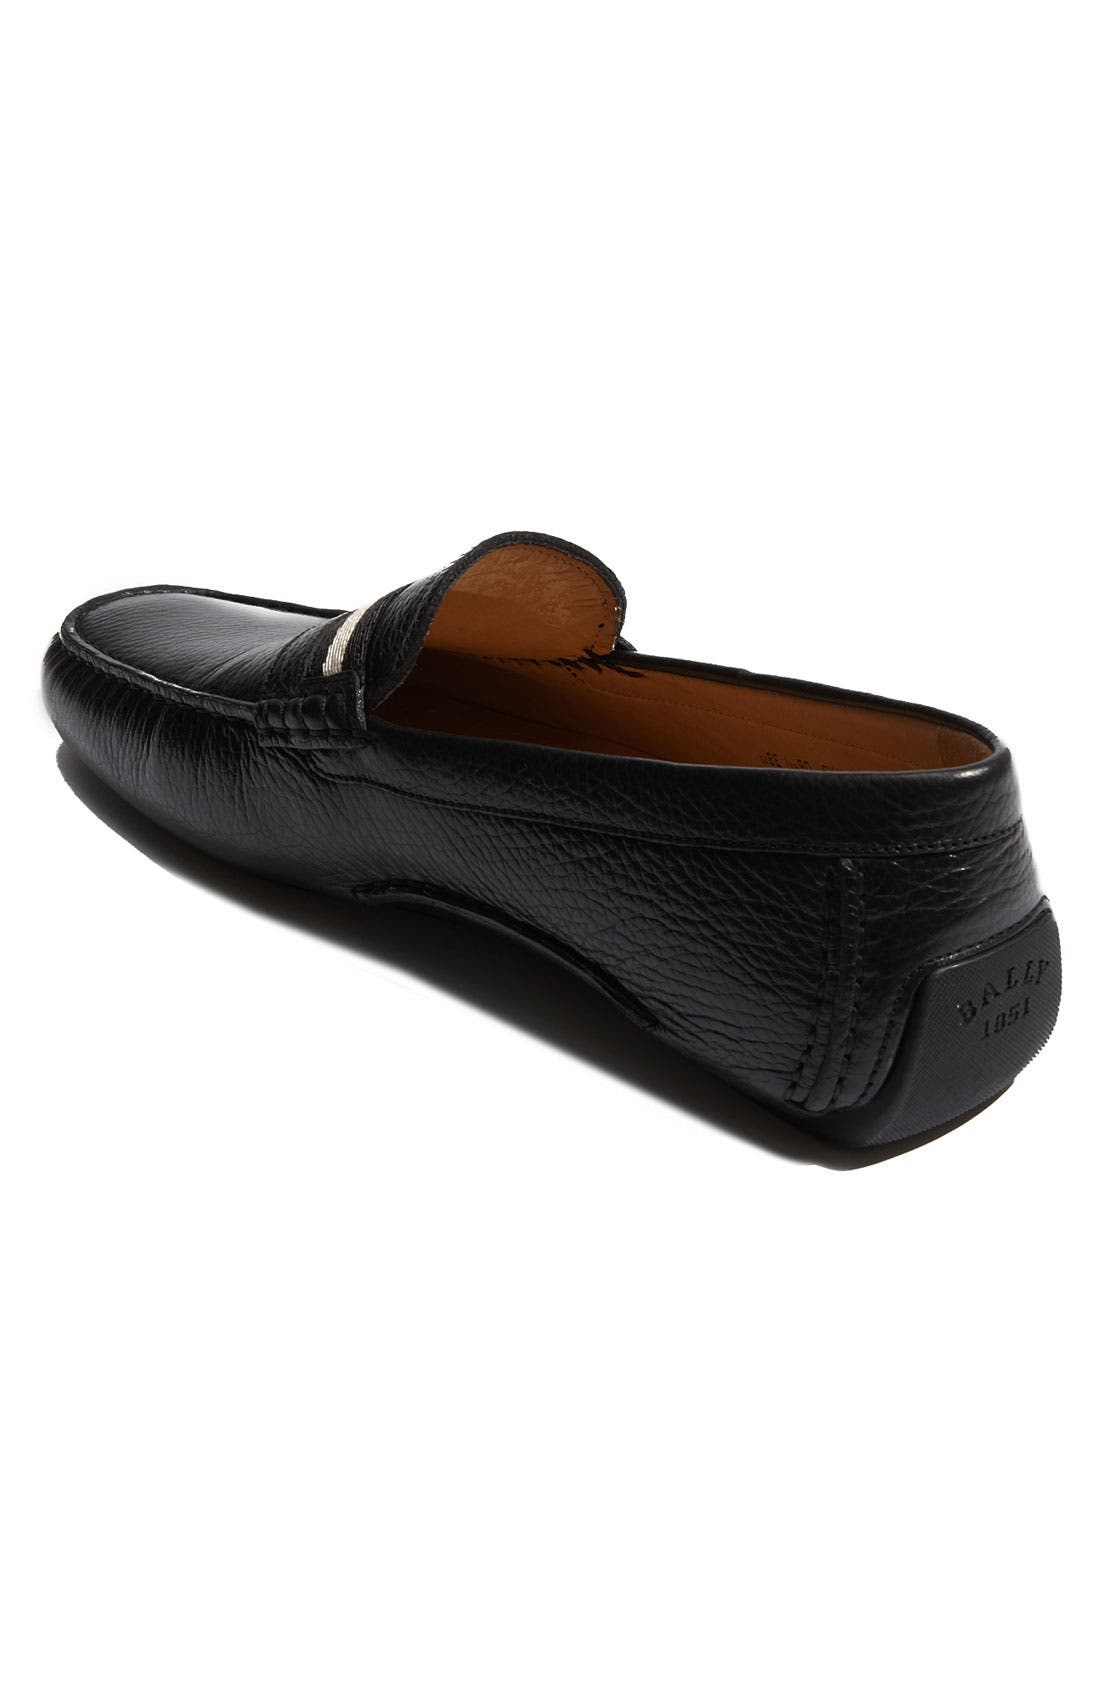 Alternate Image 2  - Bally 'Wabler' Loafer (Men)